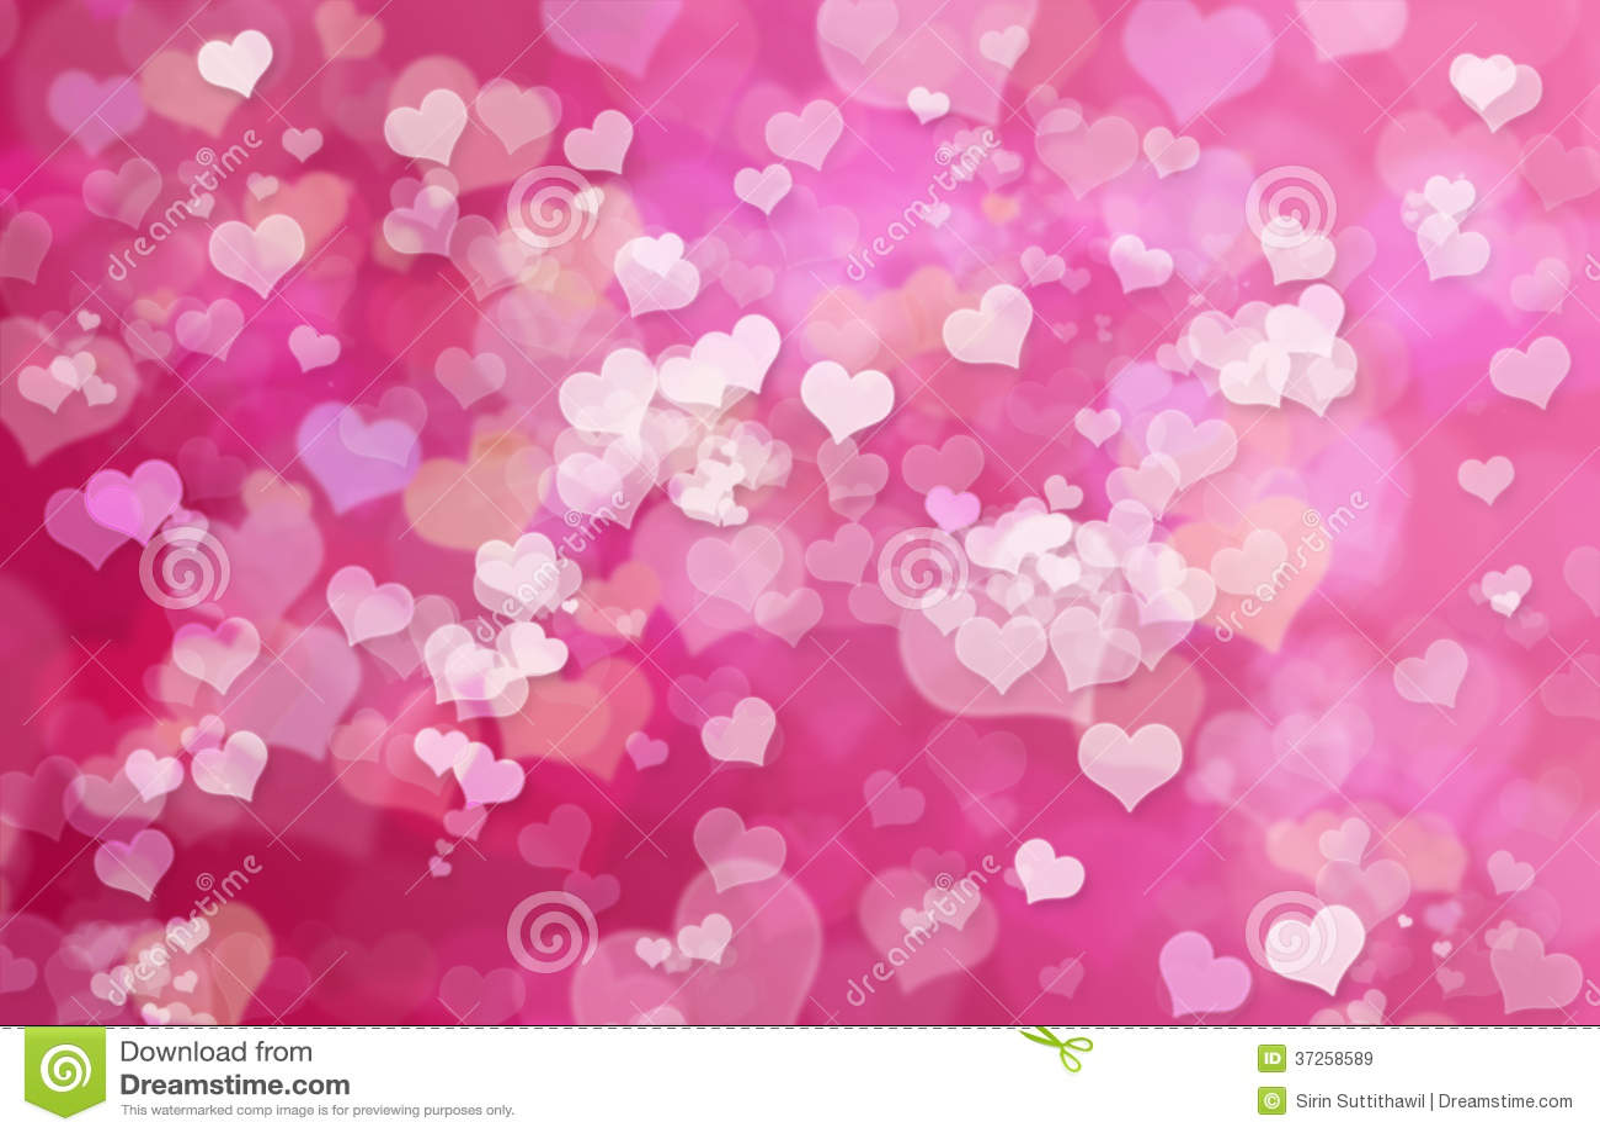 Valentine Hearts Abstract Pink Background: Valentin dagtapet